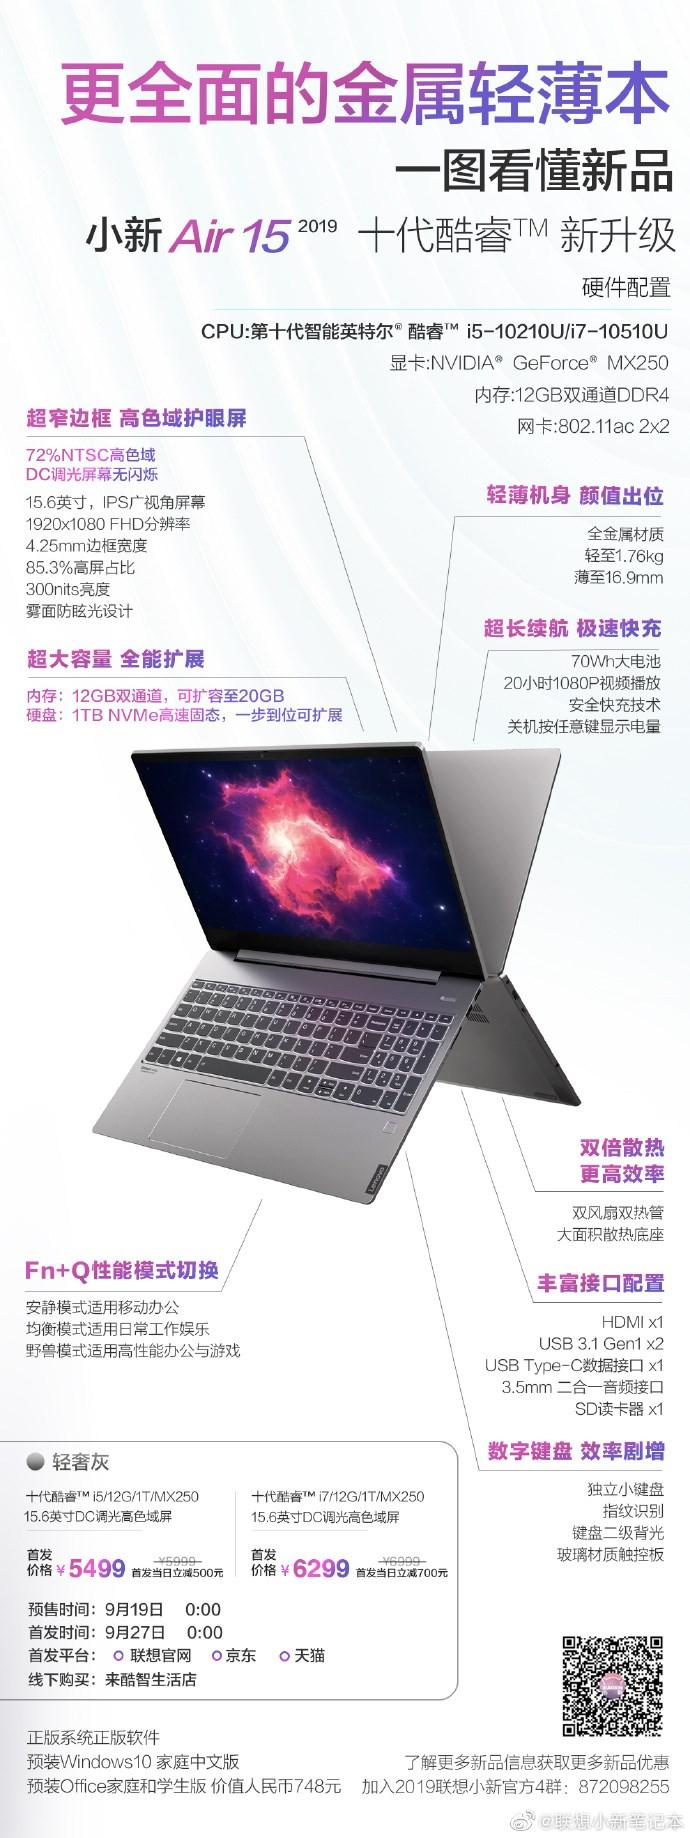 http://chengrj.cn/youxi/195461.html